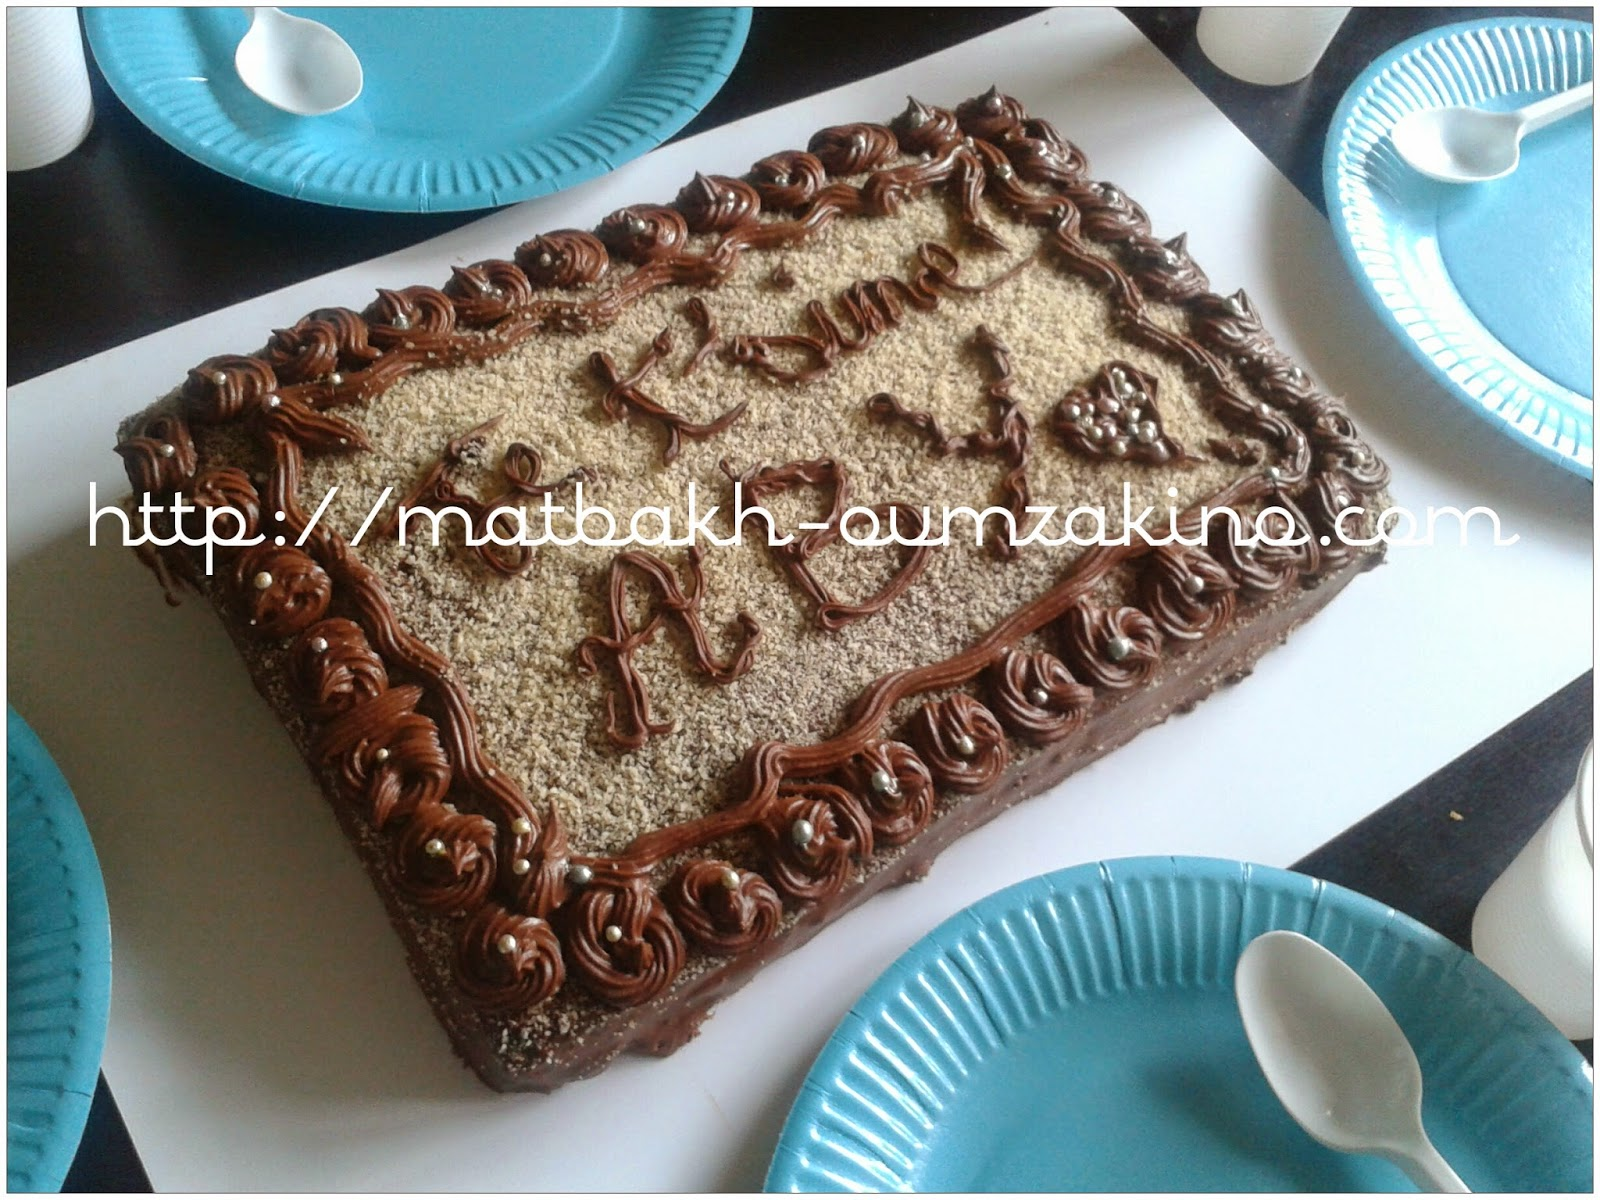 gateau creme mousseline matbakh-oumzakino.com